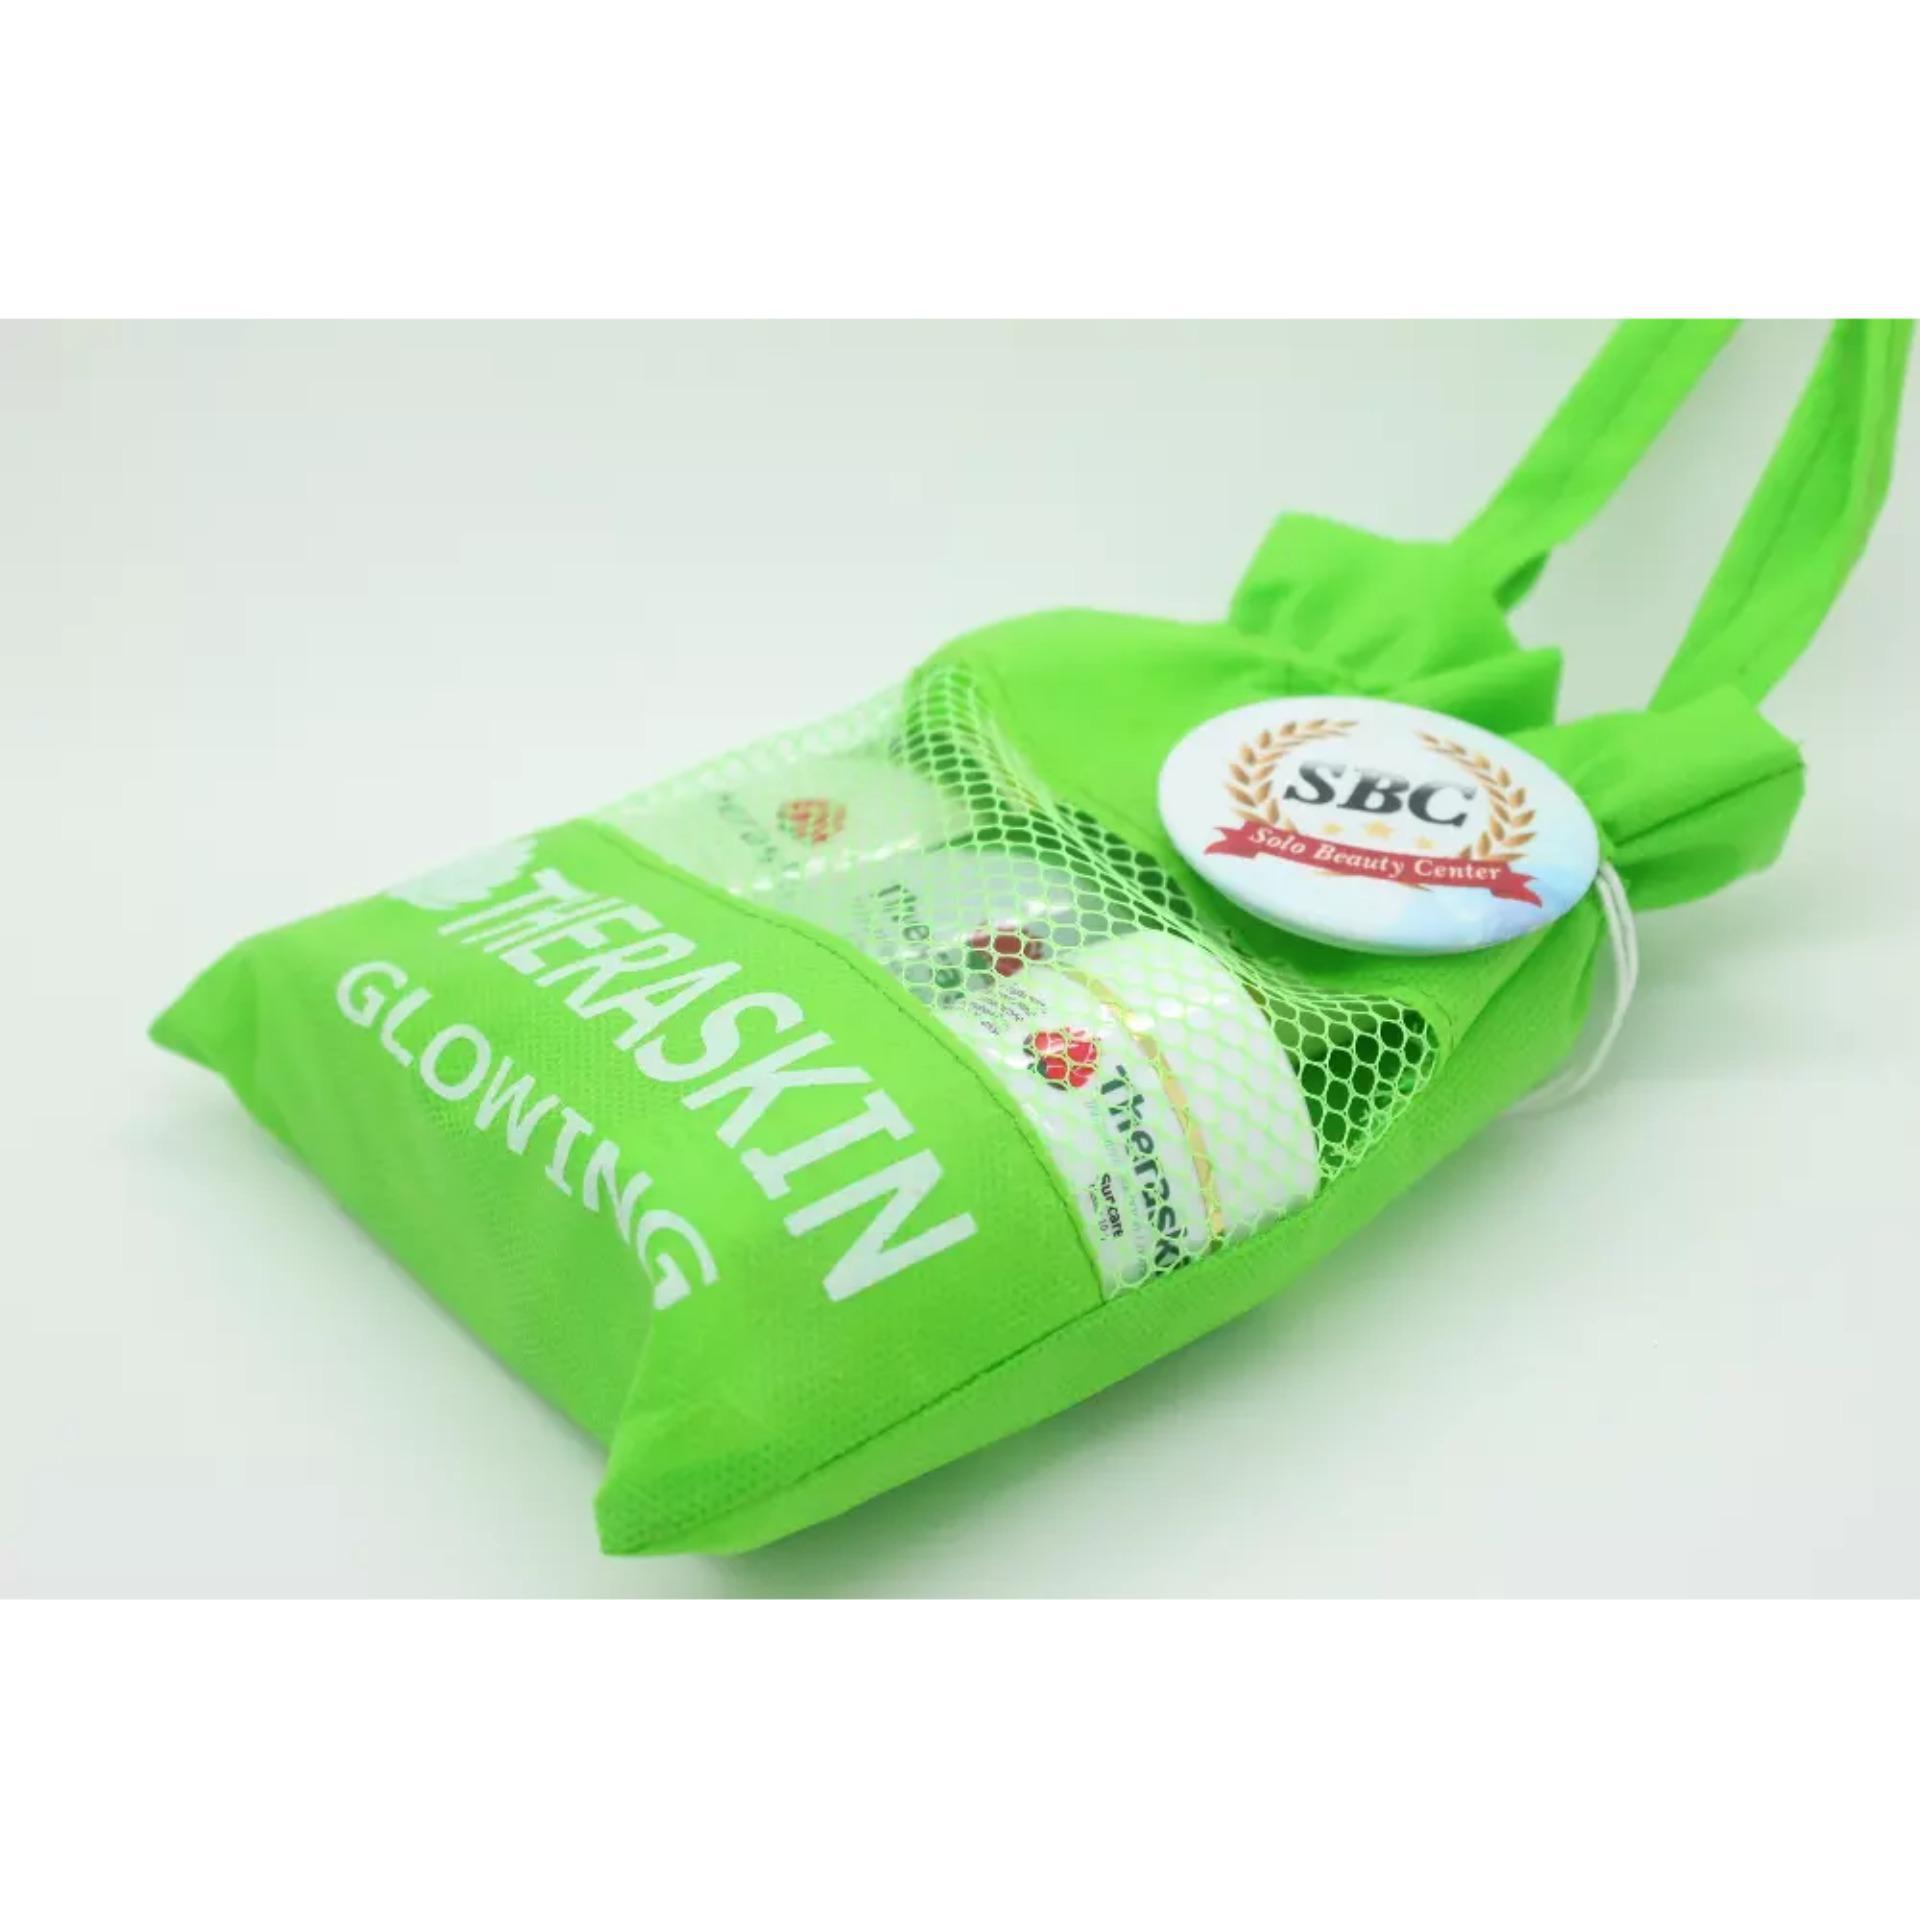 Harga Penawaran Cream Theraskin Paket Glowing Terbaik Murah Teraskin